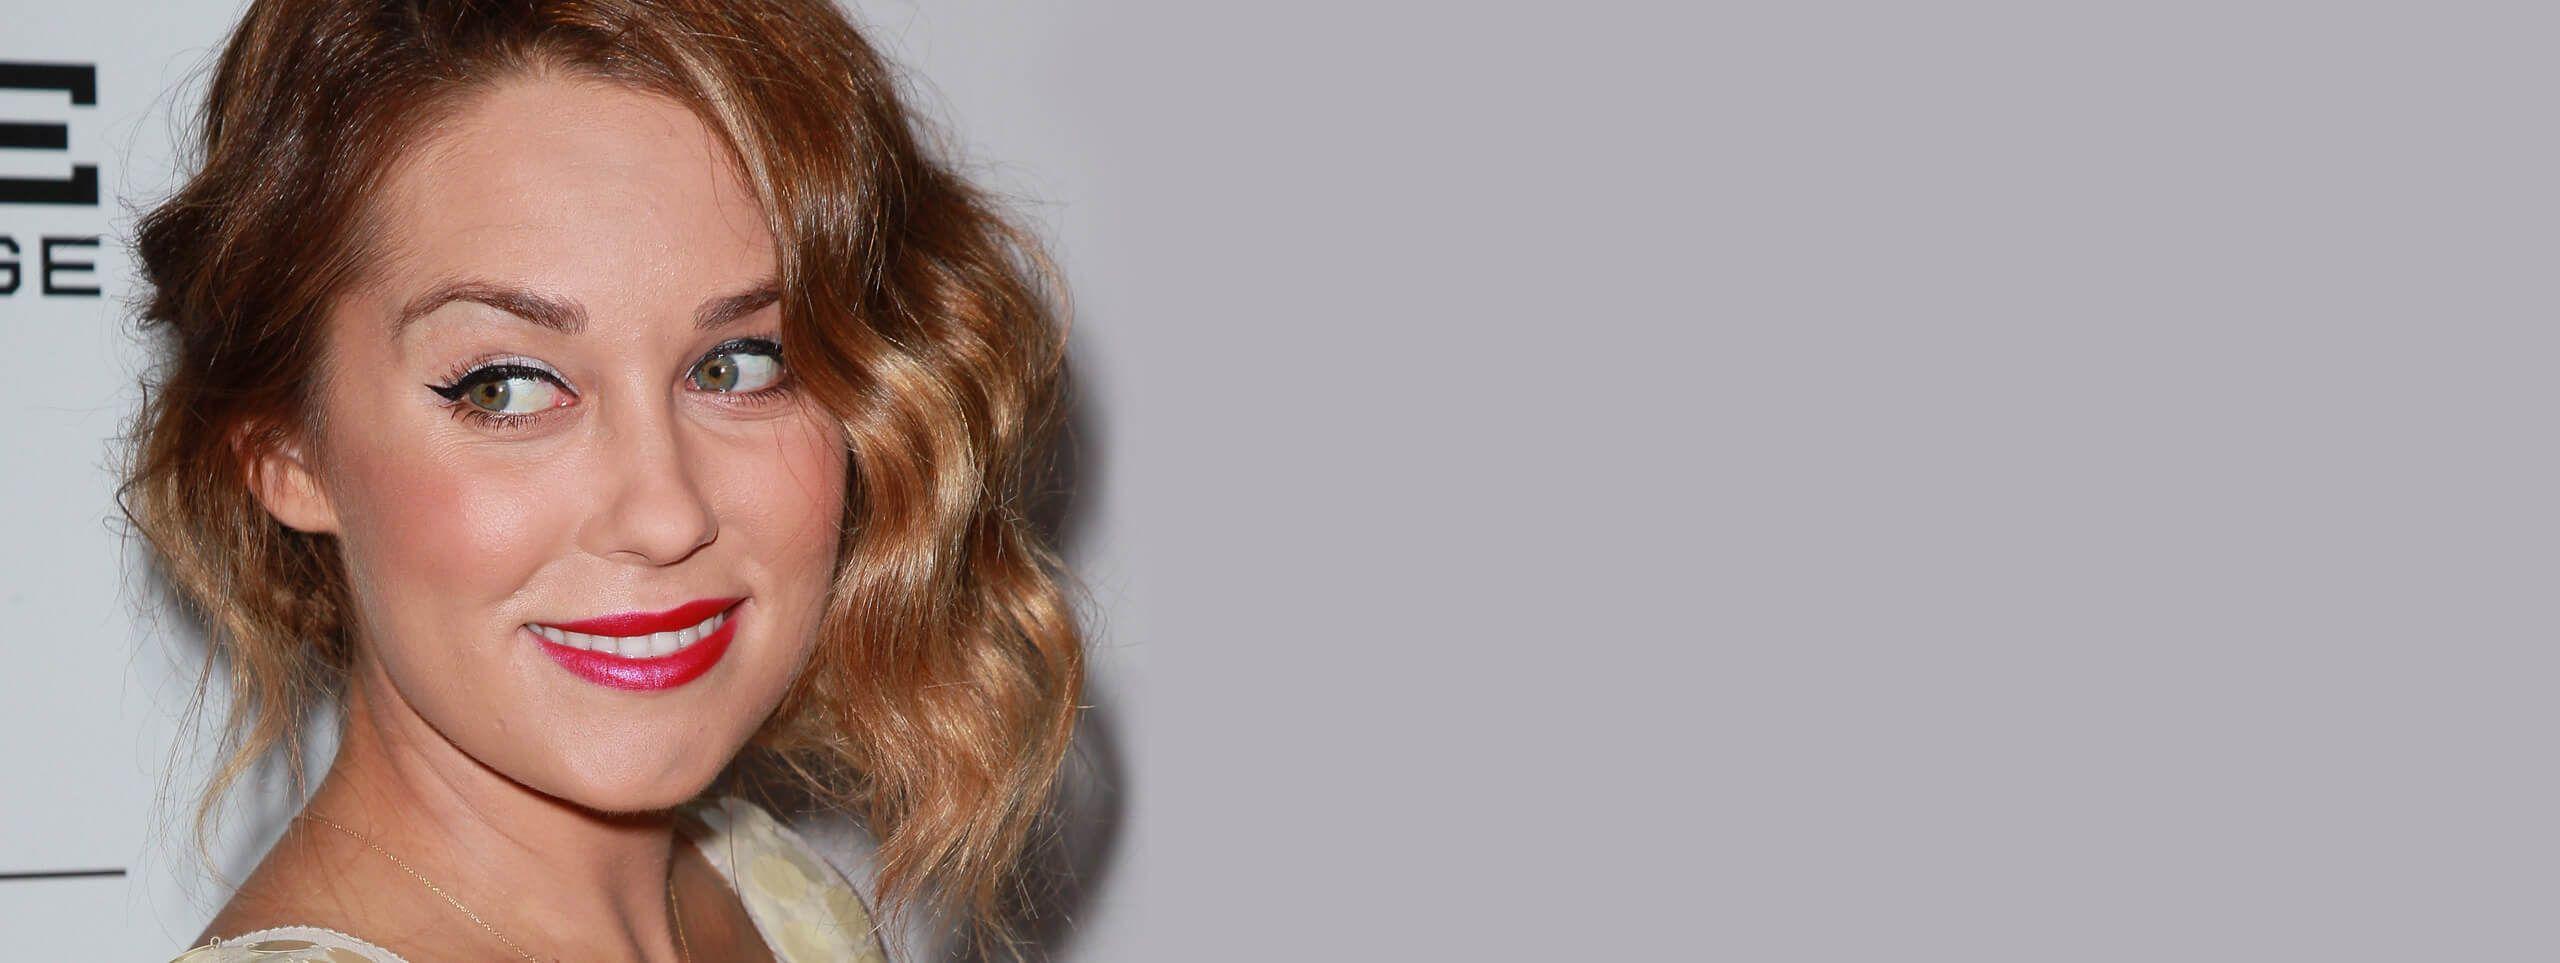 Lauren Conrad rocks caramel hair color trend